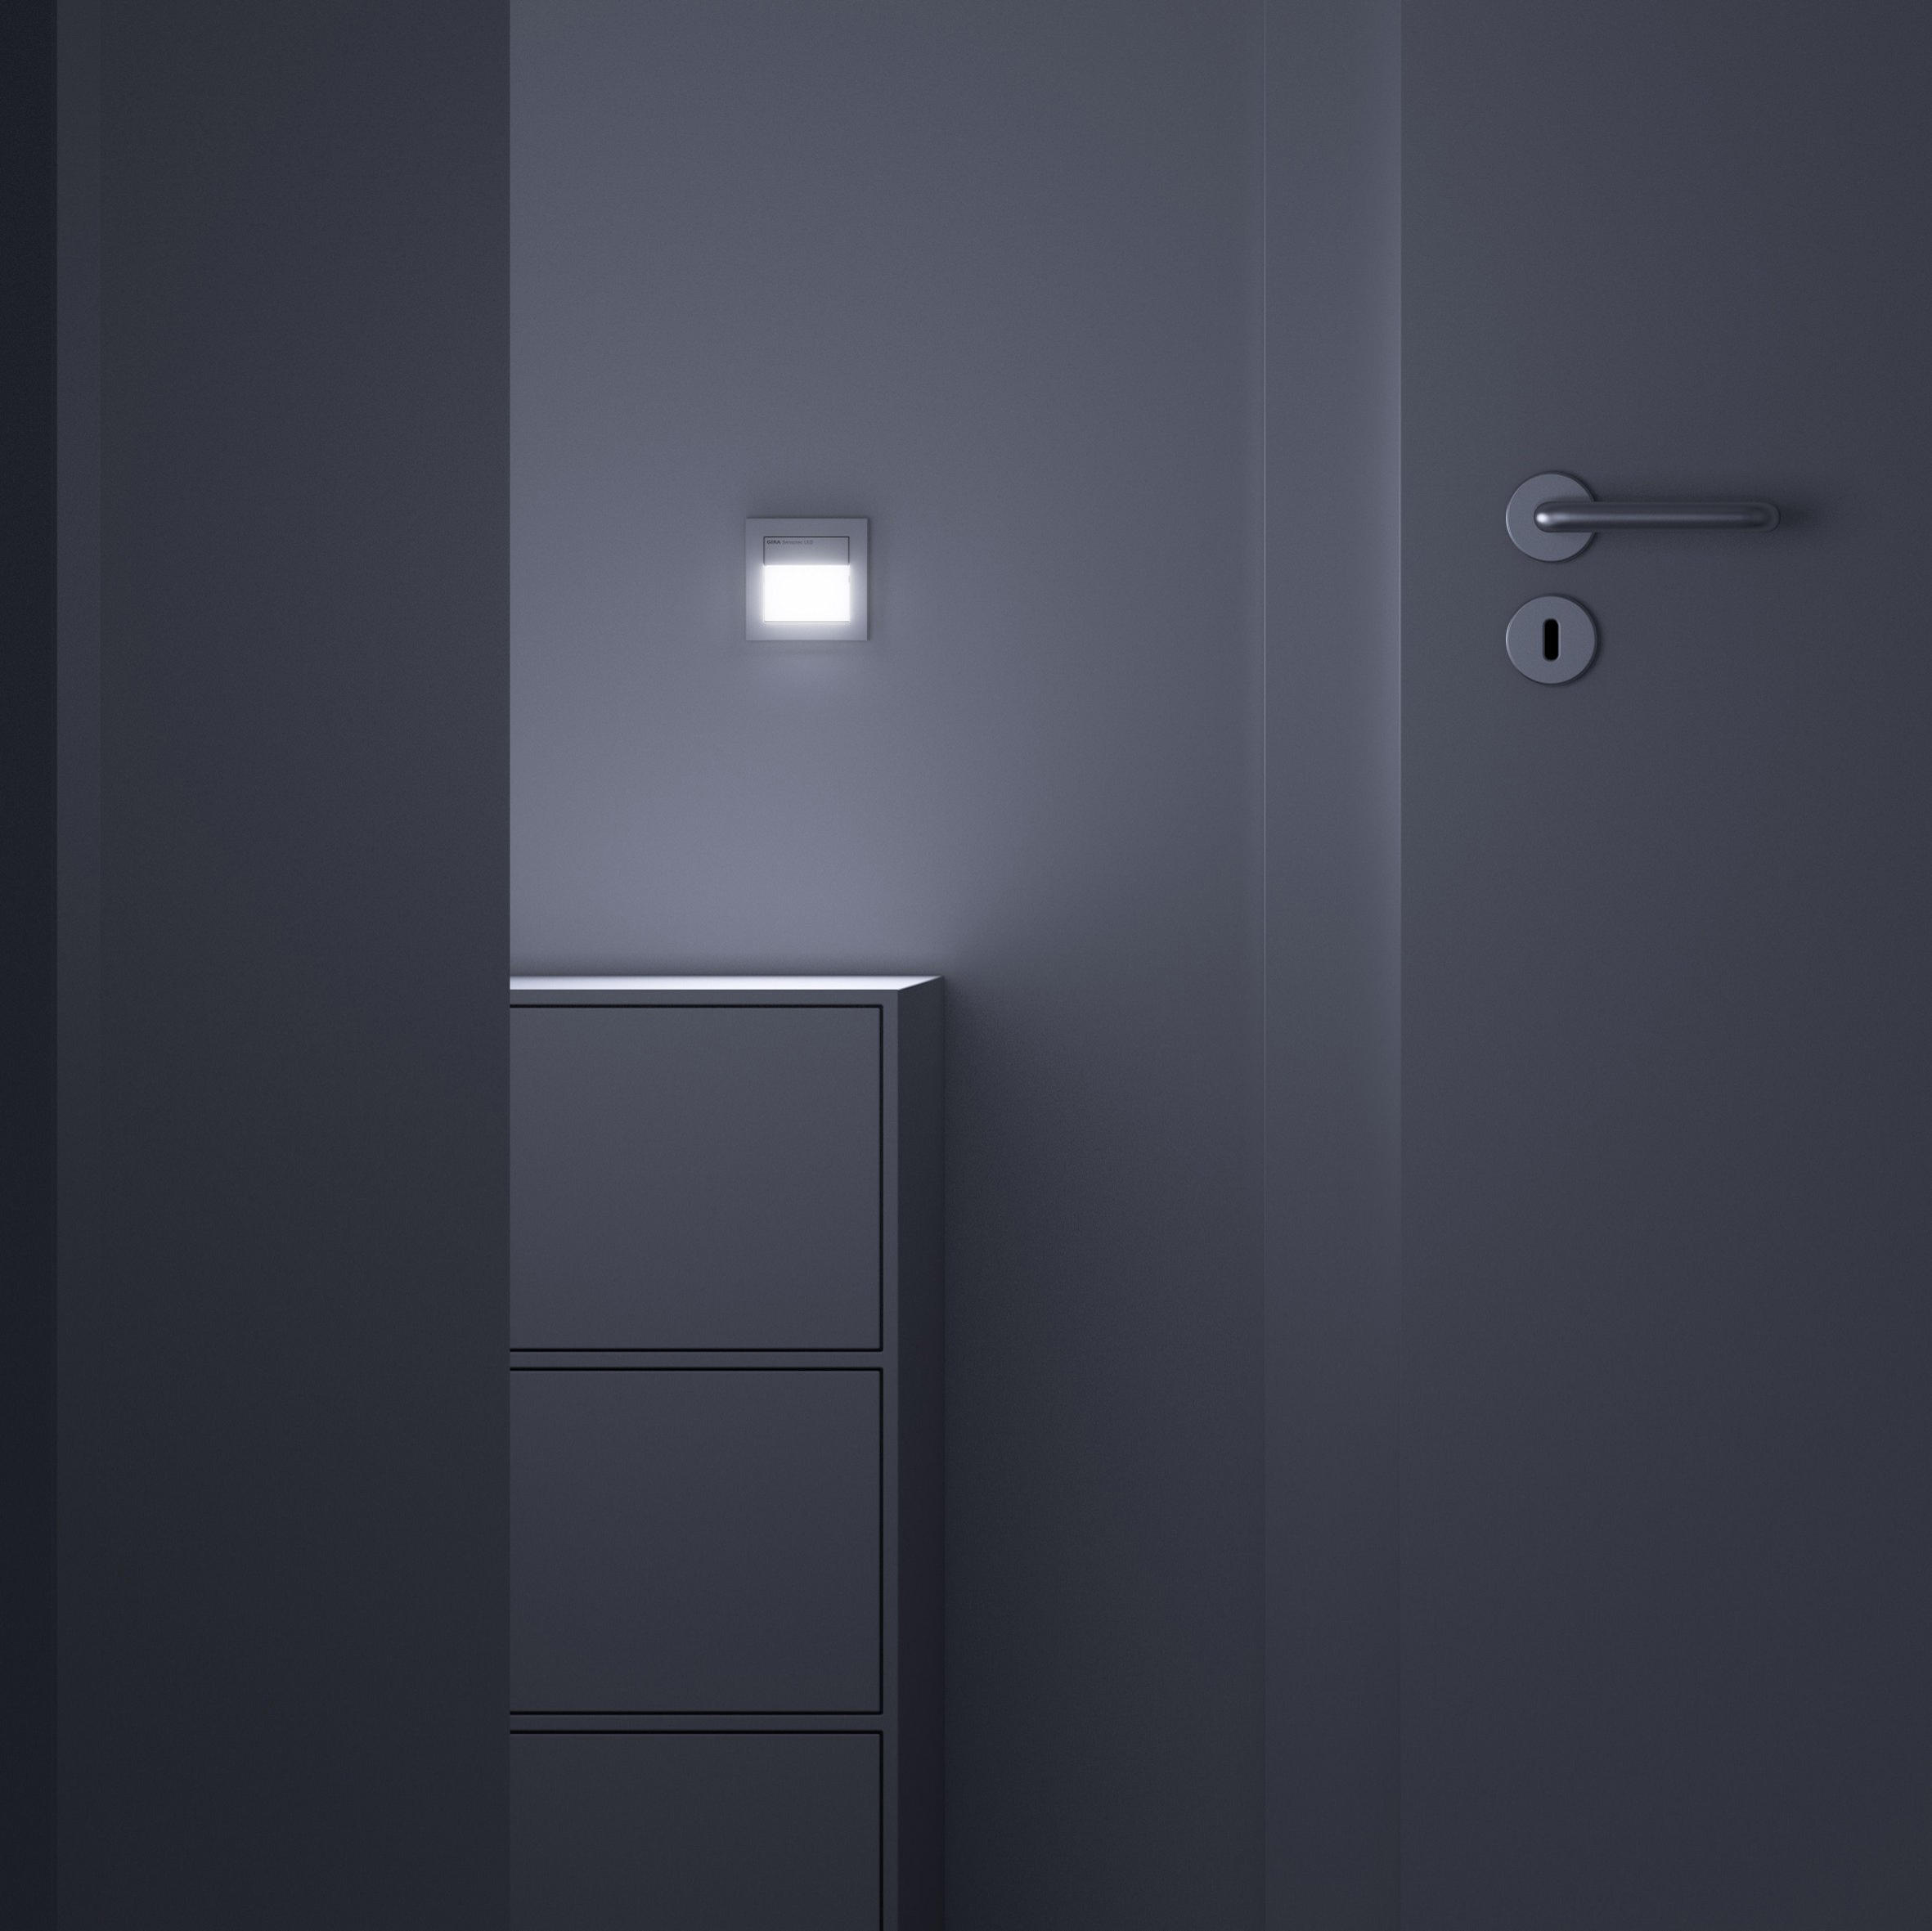 sensotec bewegungsmelder von gira architonic. Black Bedroom Furniture Sets. Home Design Ideas